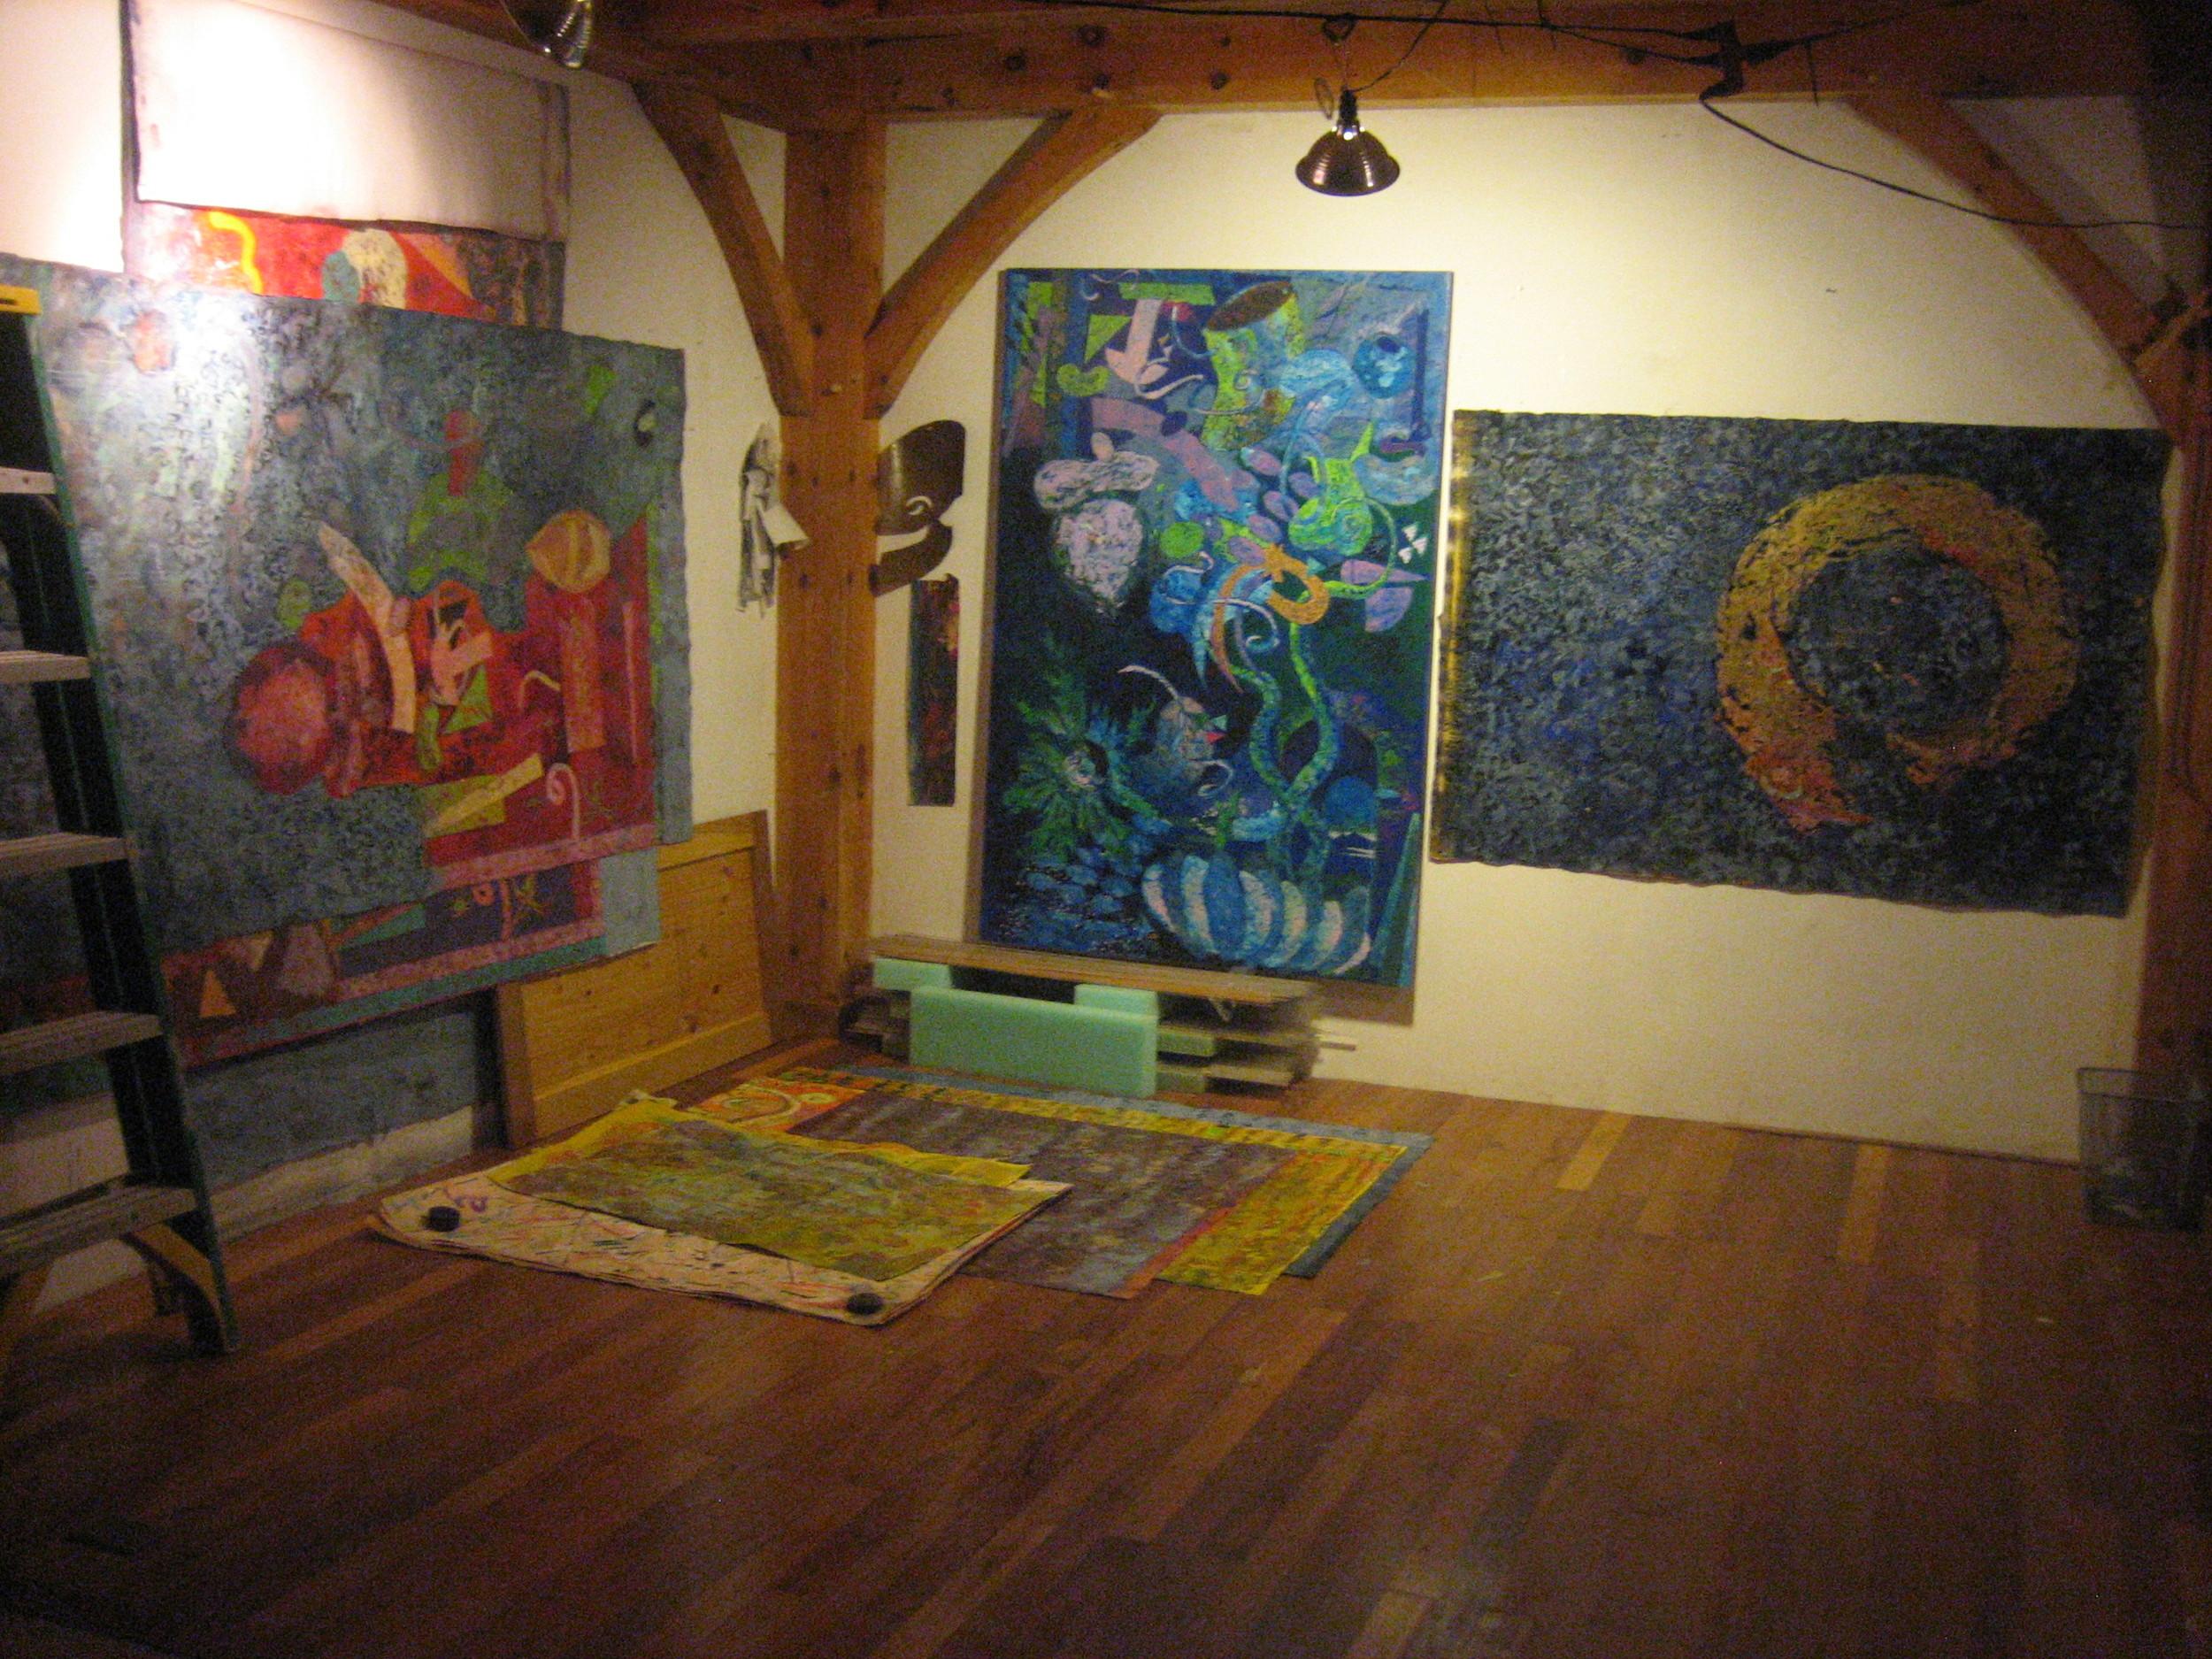 Inside the artist's studio on Cape Cod